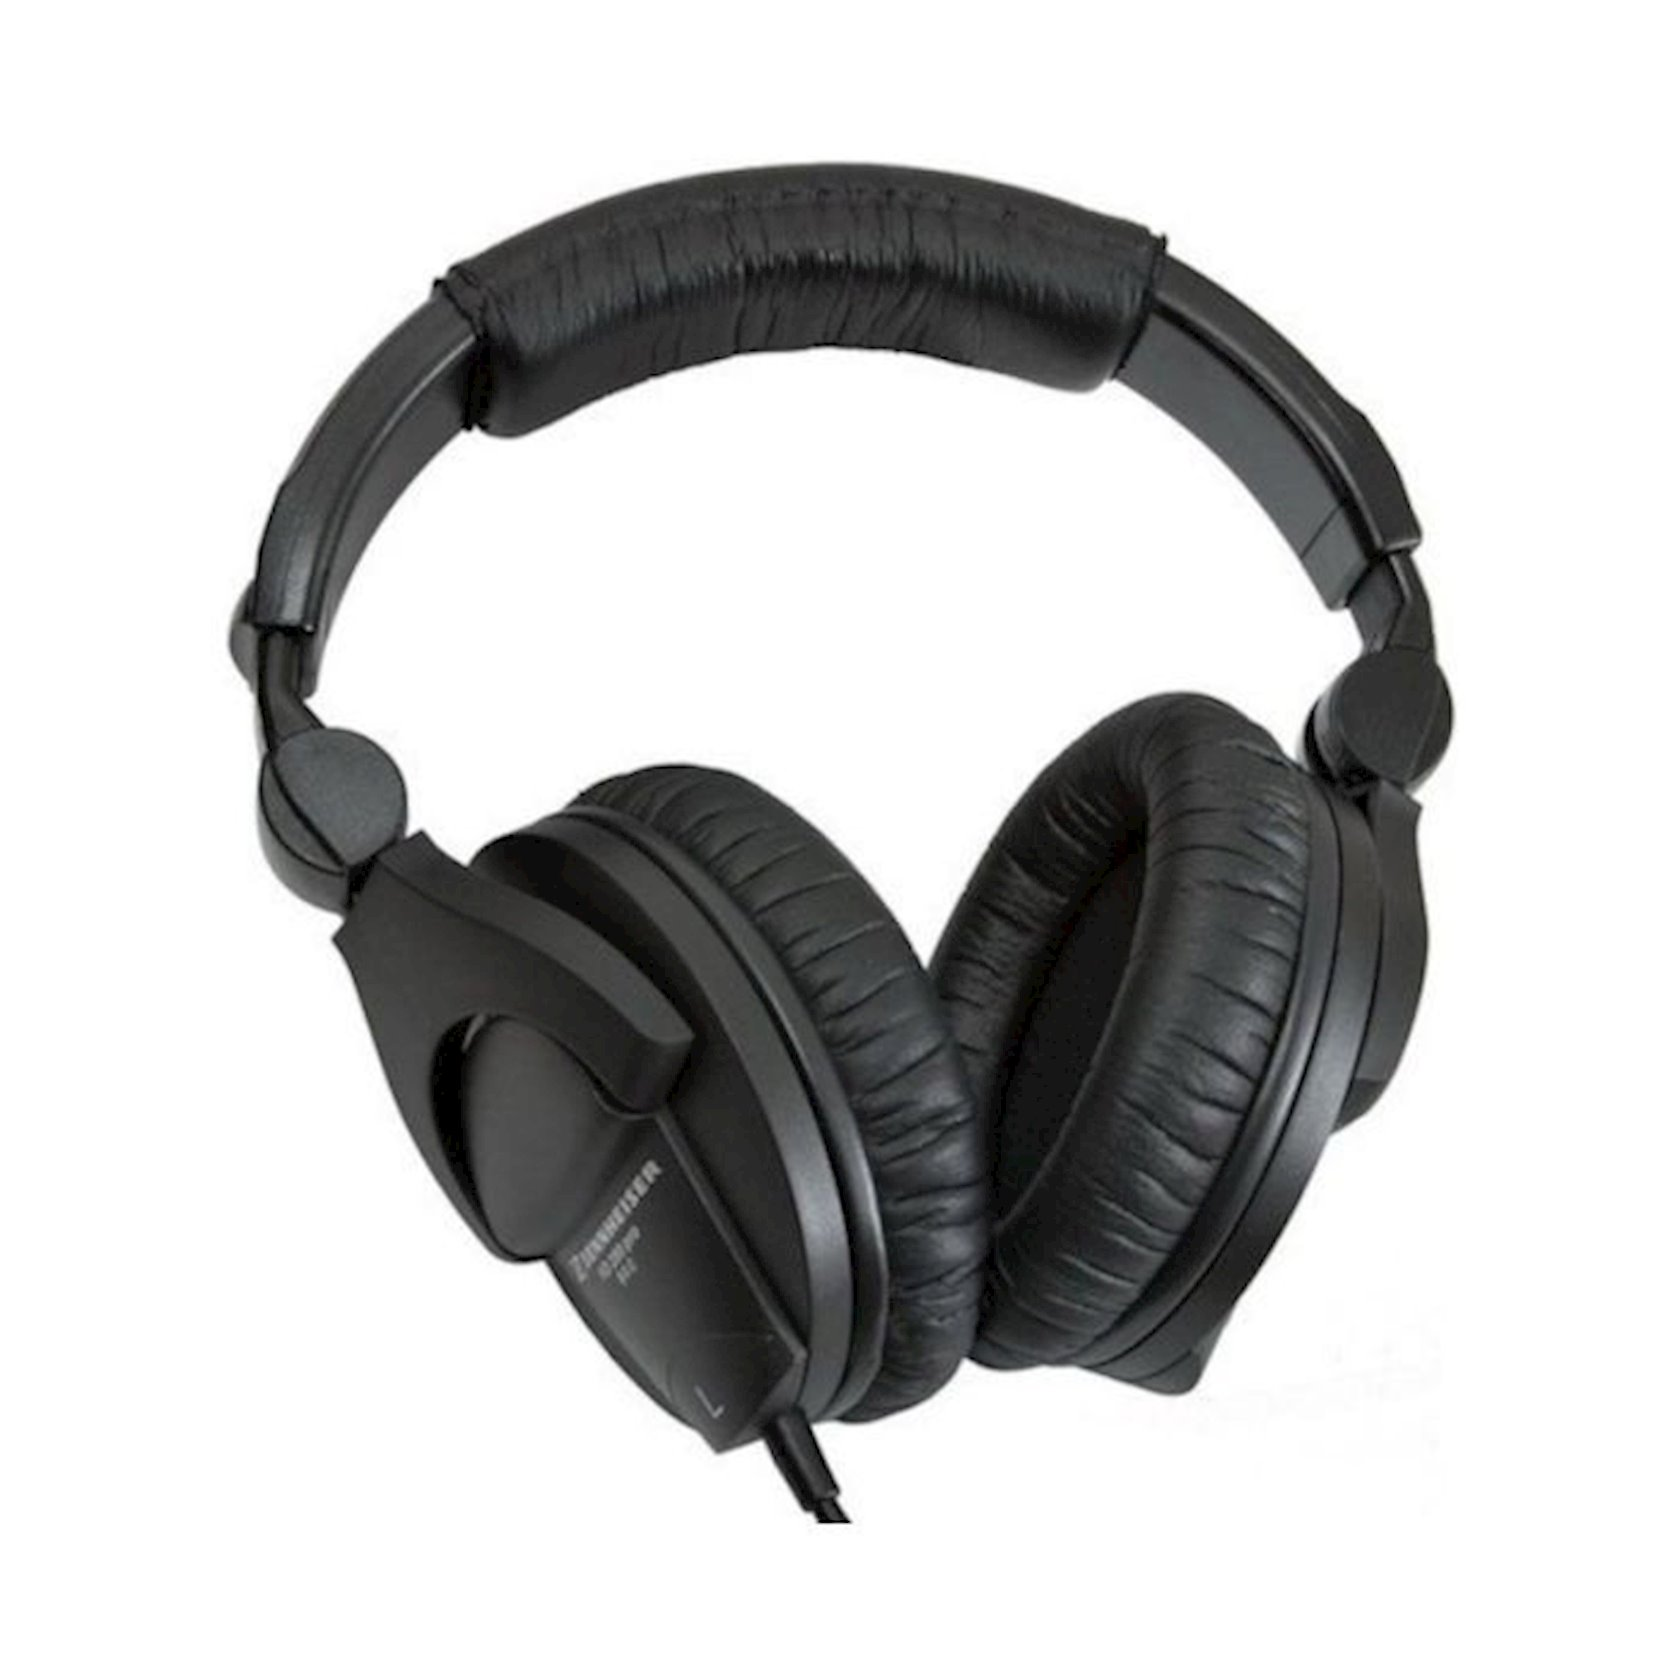 Simli qulaqlıqlar Sennheiser HD 280 PRO Black